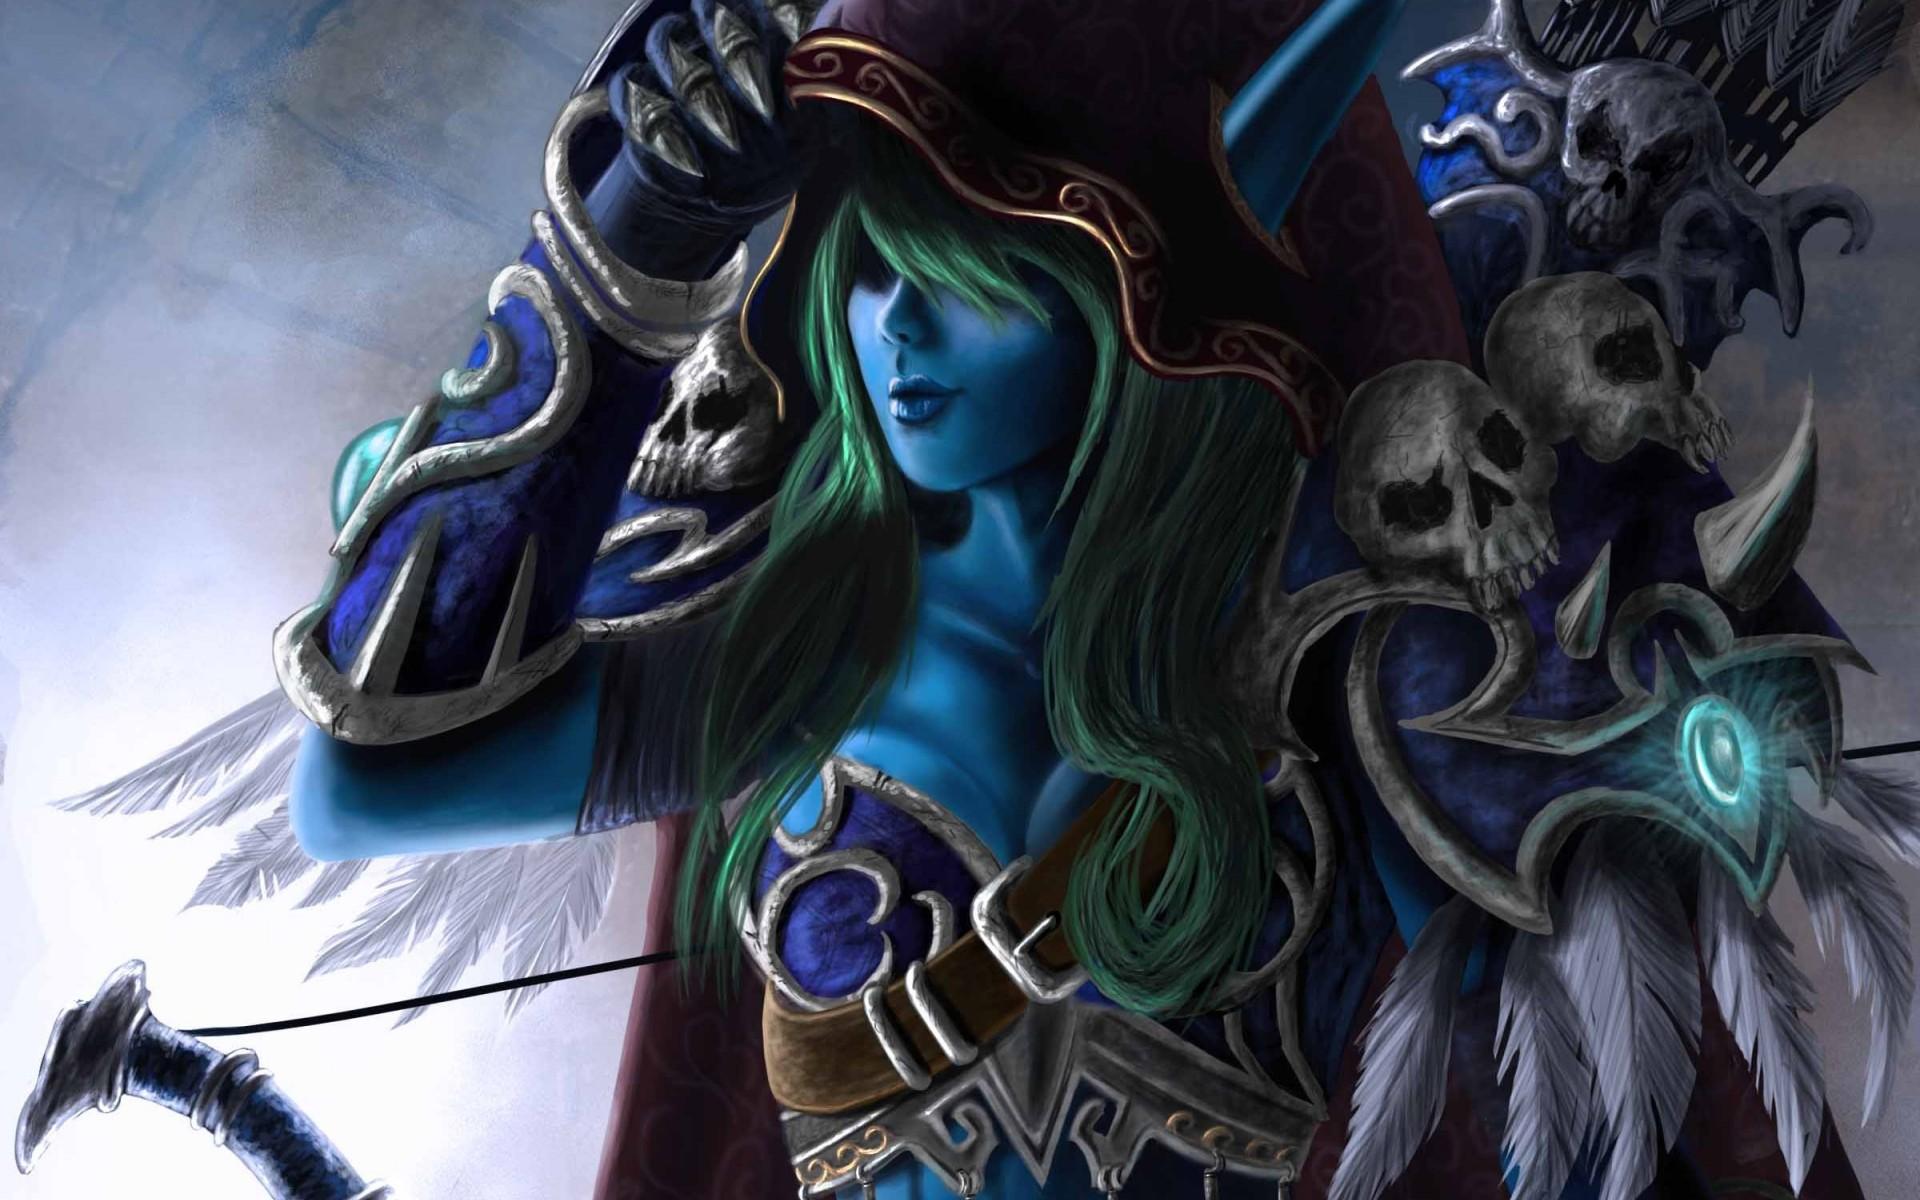 Werewolf 3d Wallpaper World Of Warcraft Full Hd Wallpaper And Background Image